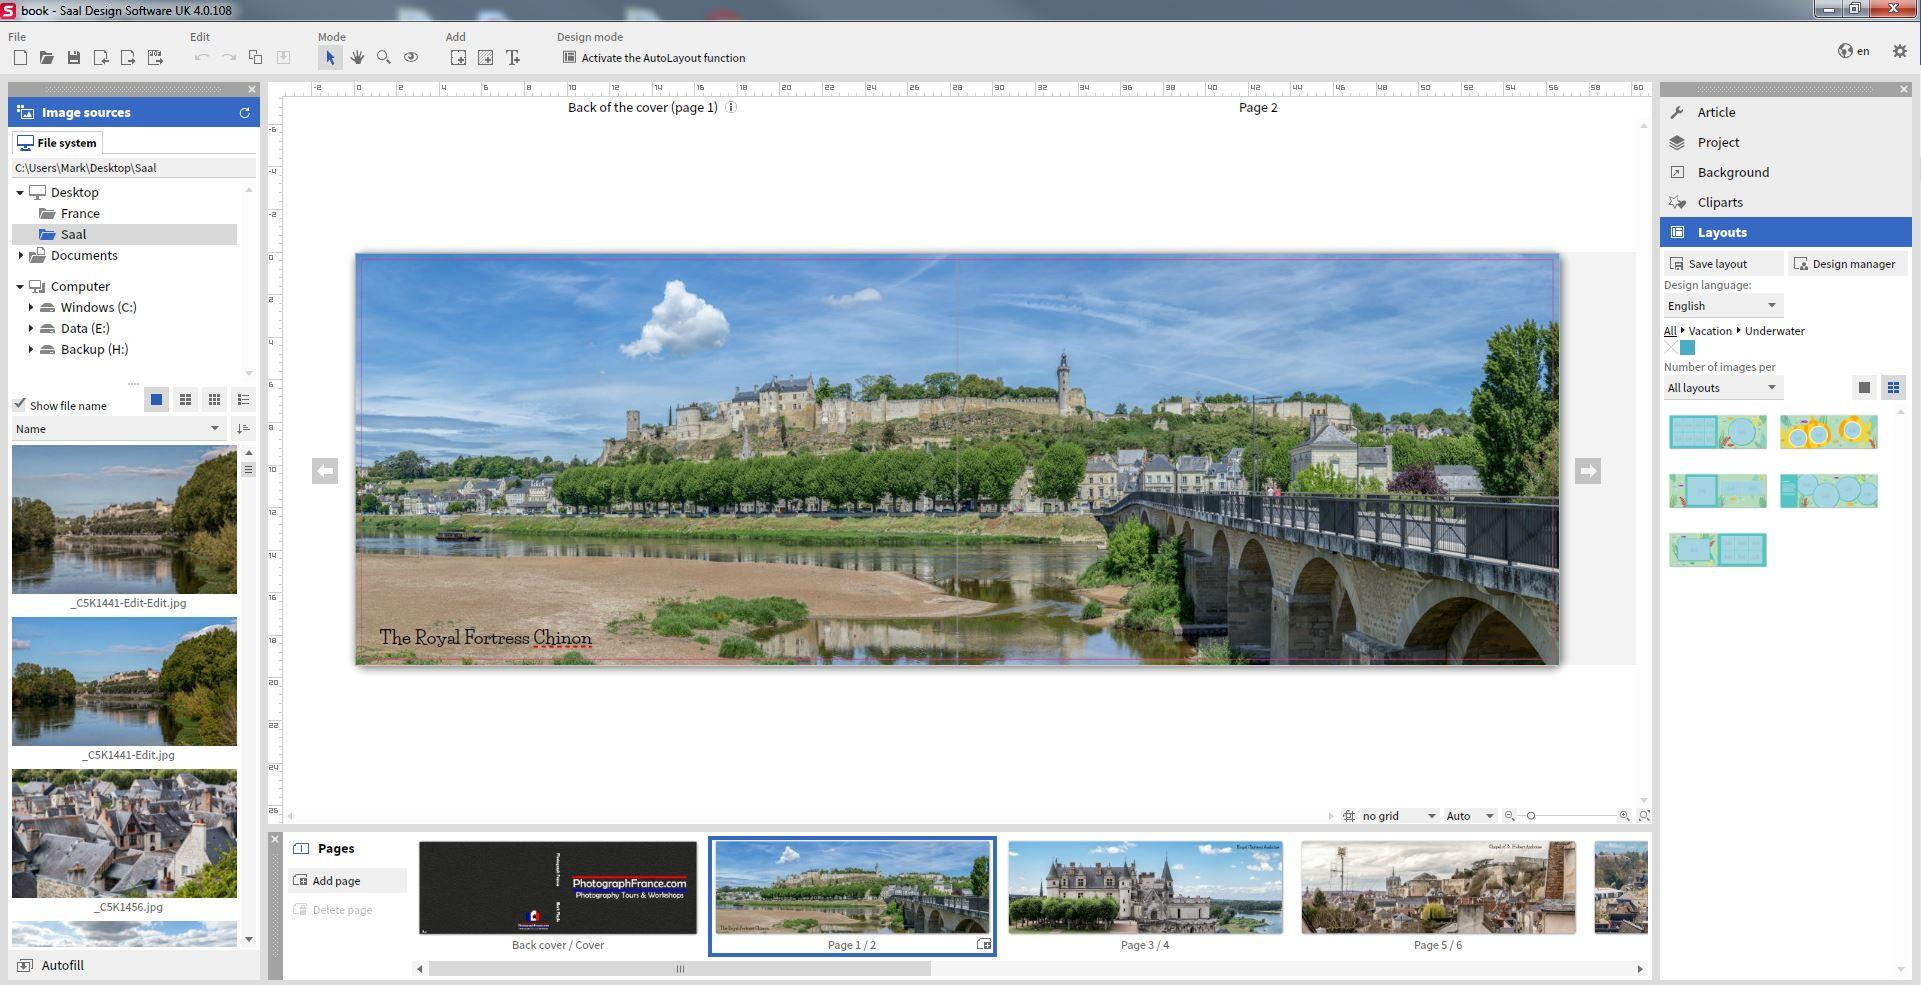 Saal-Digital design software